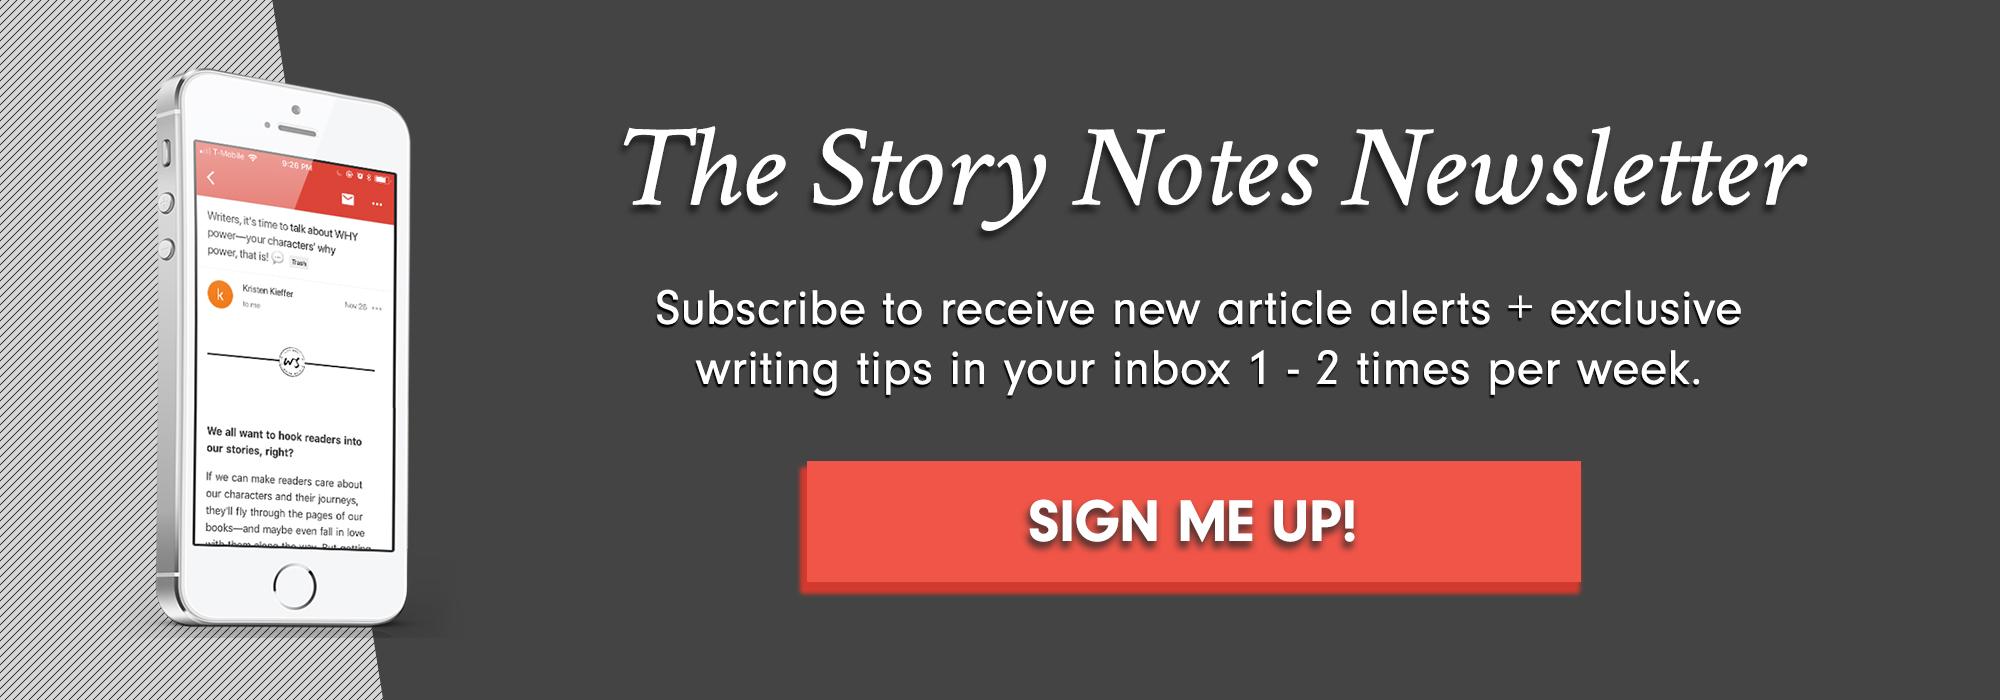 storynotes.jpg